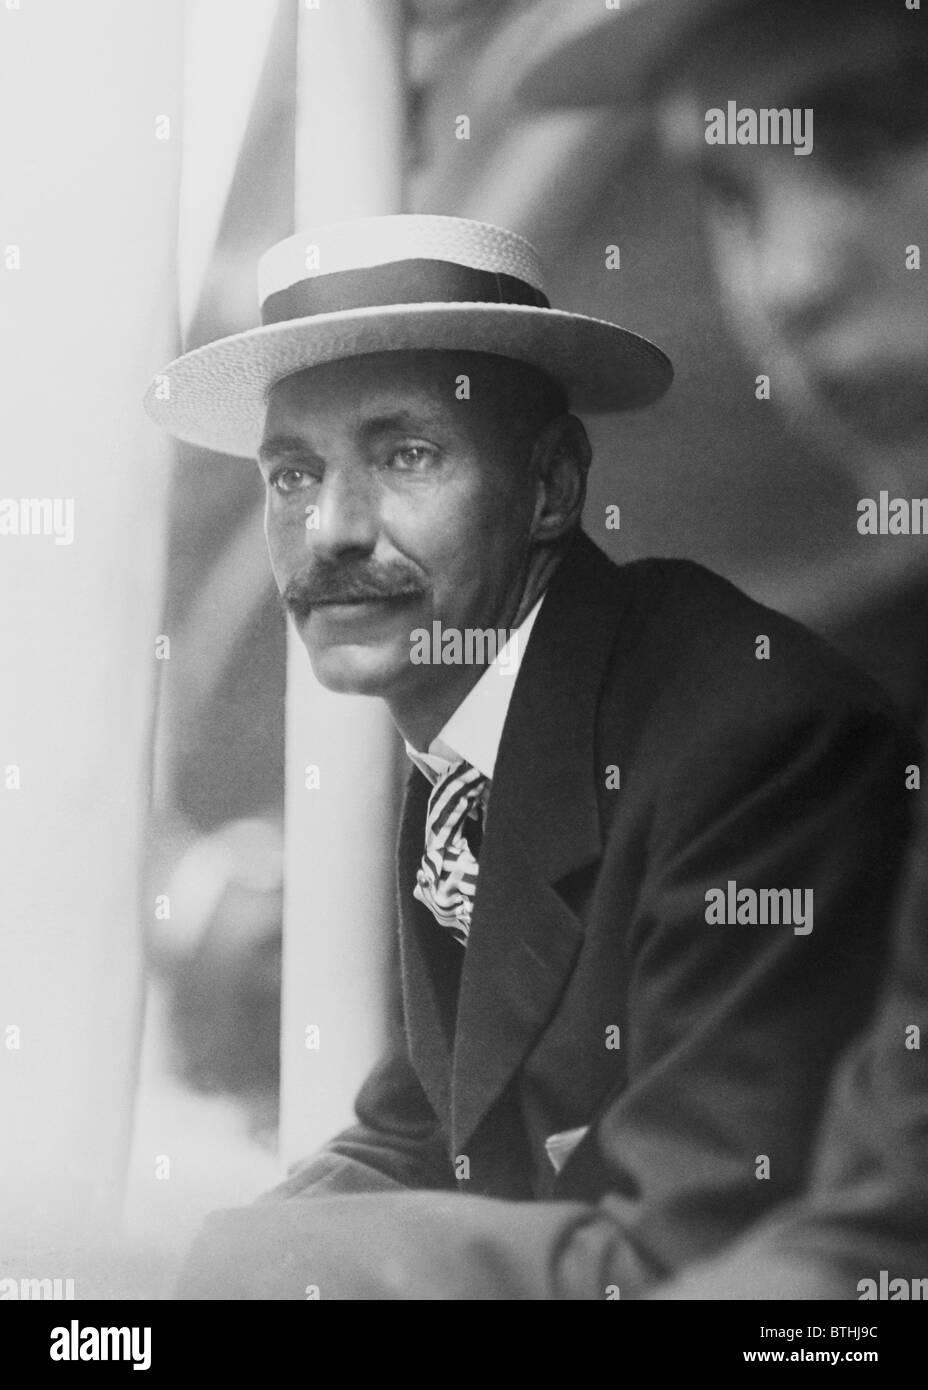 Vintage photo c1909 of millionaire American businessman + Titanic victim John Jacob Astor IV (1864 - 1912). - Stock Image